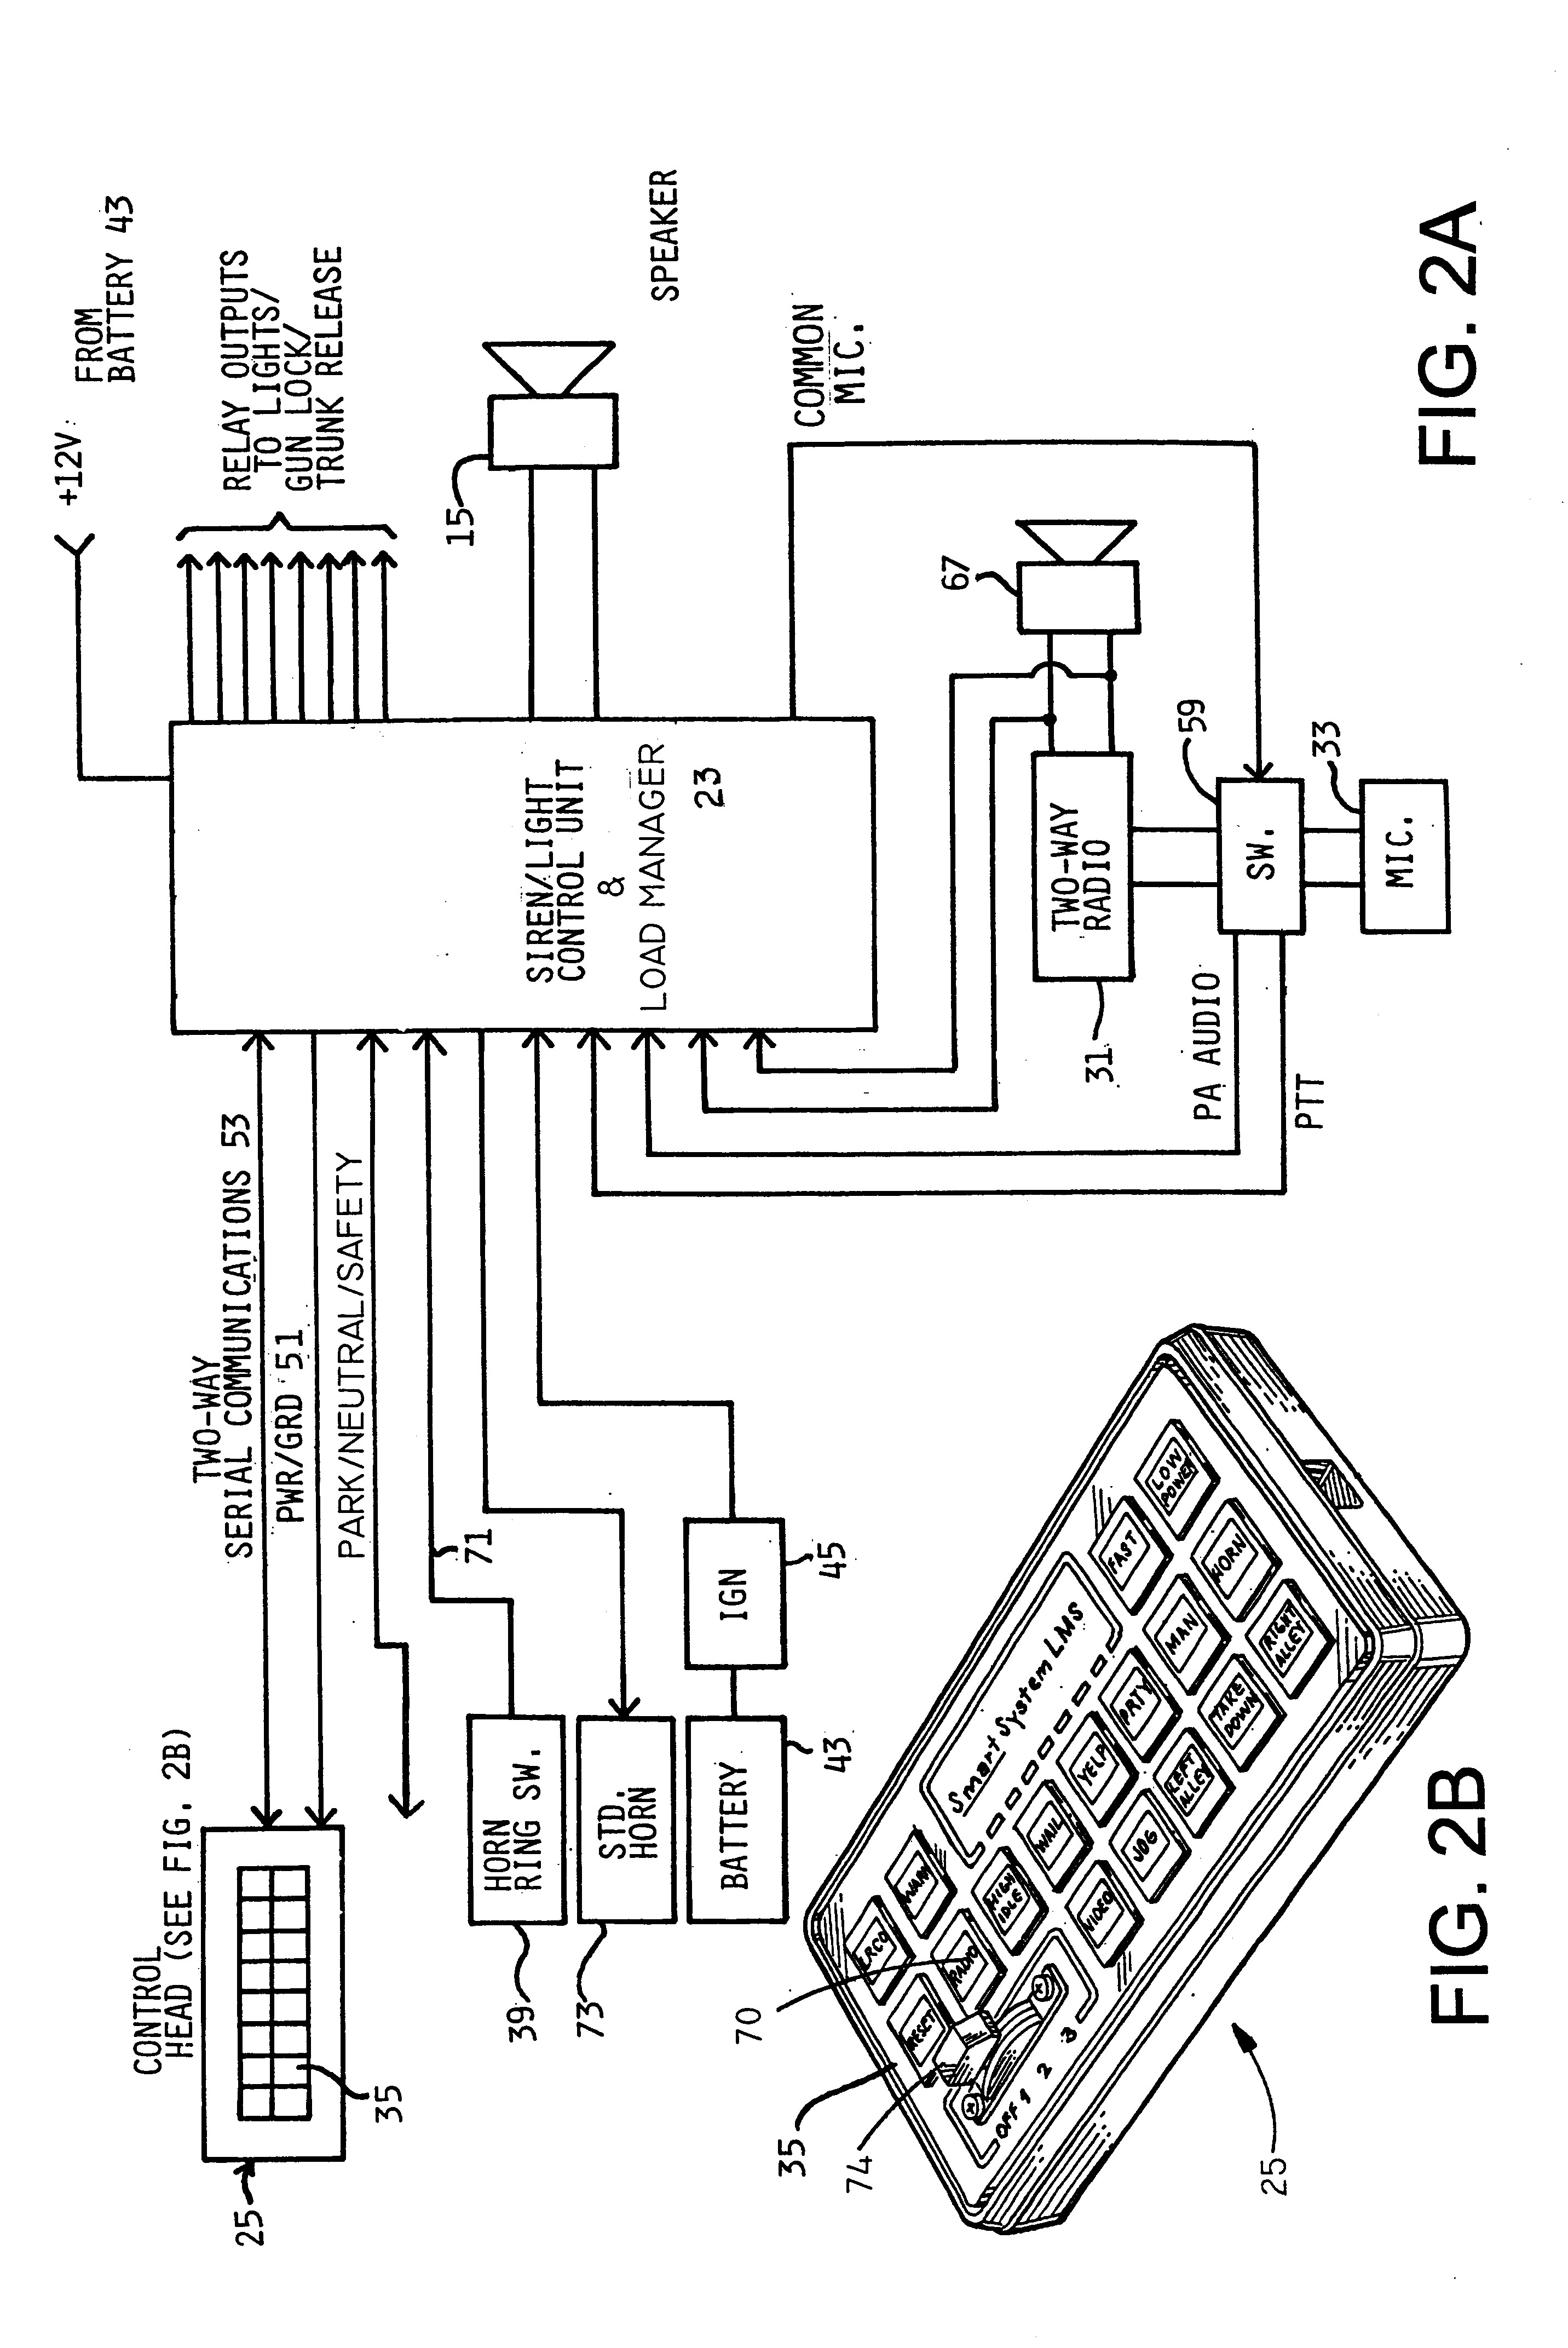 car wiring diagrams uk telephone terminal block diagram secequip siren 15 23 tefolia de auto electrical related with